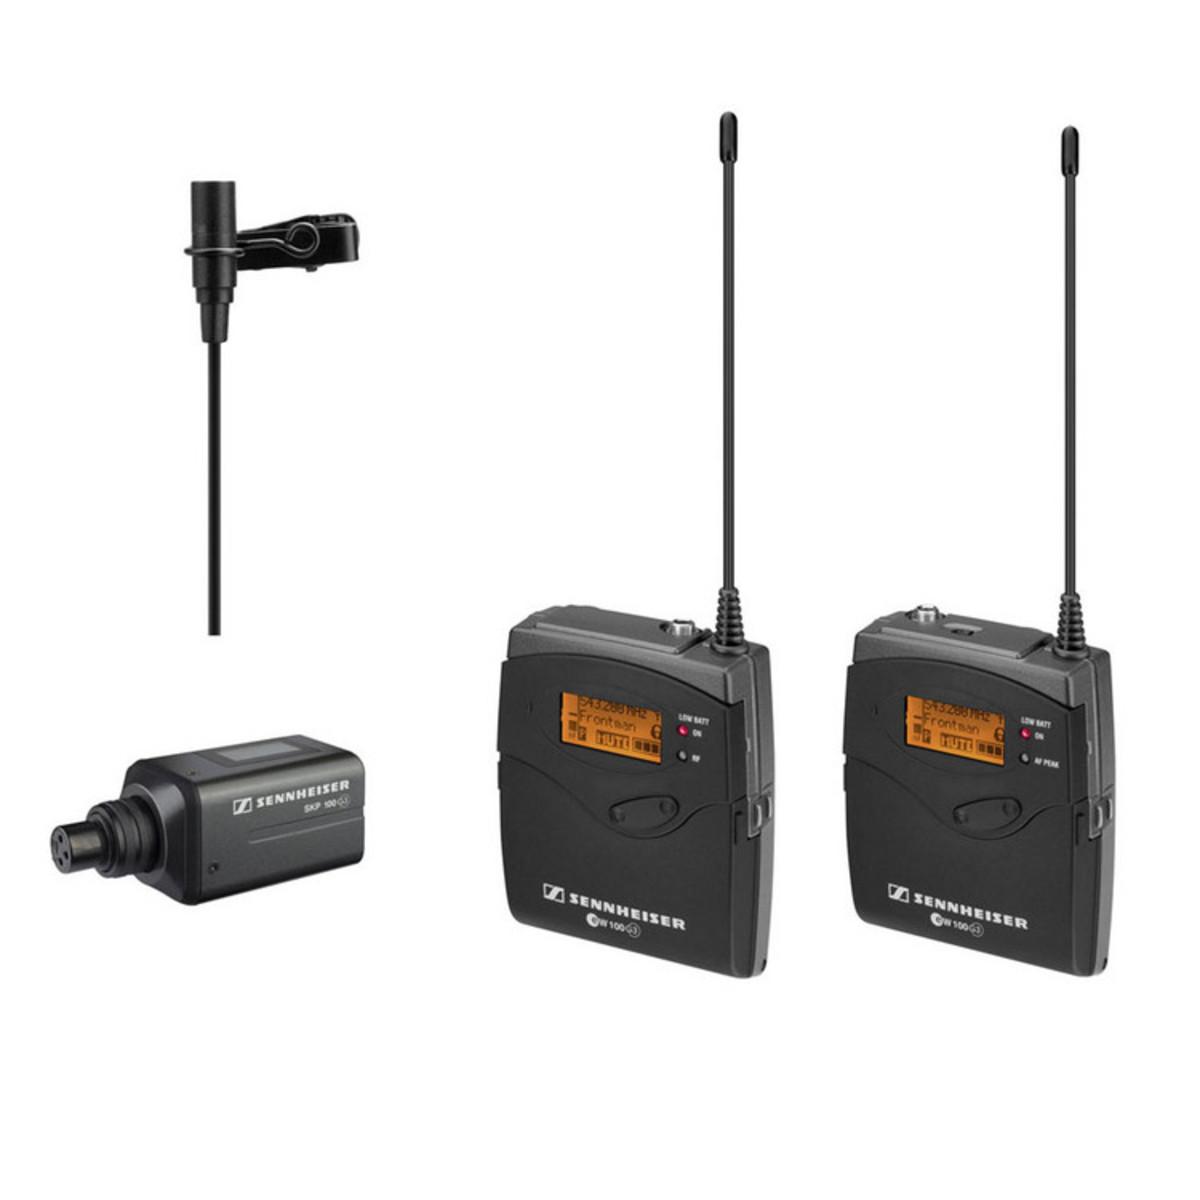 sennheiser ew 100 eng g3 gb wireless audio system at gear4music. Black Bedroom Furniture Sets. Home Design Ideas